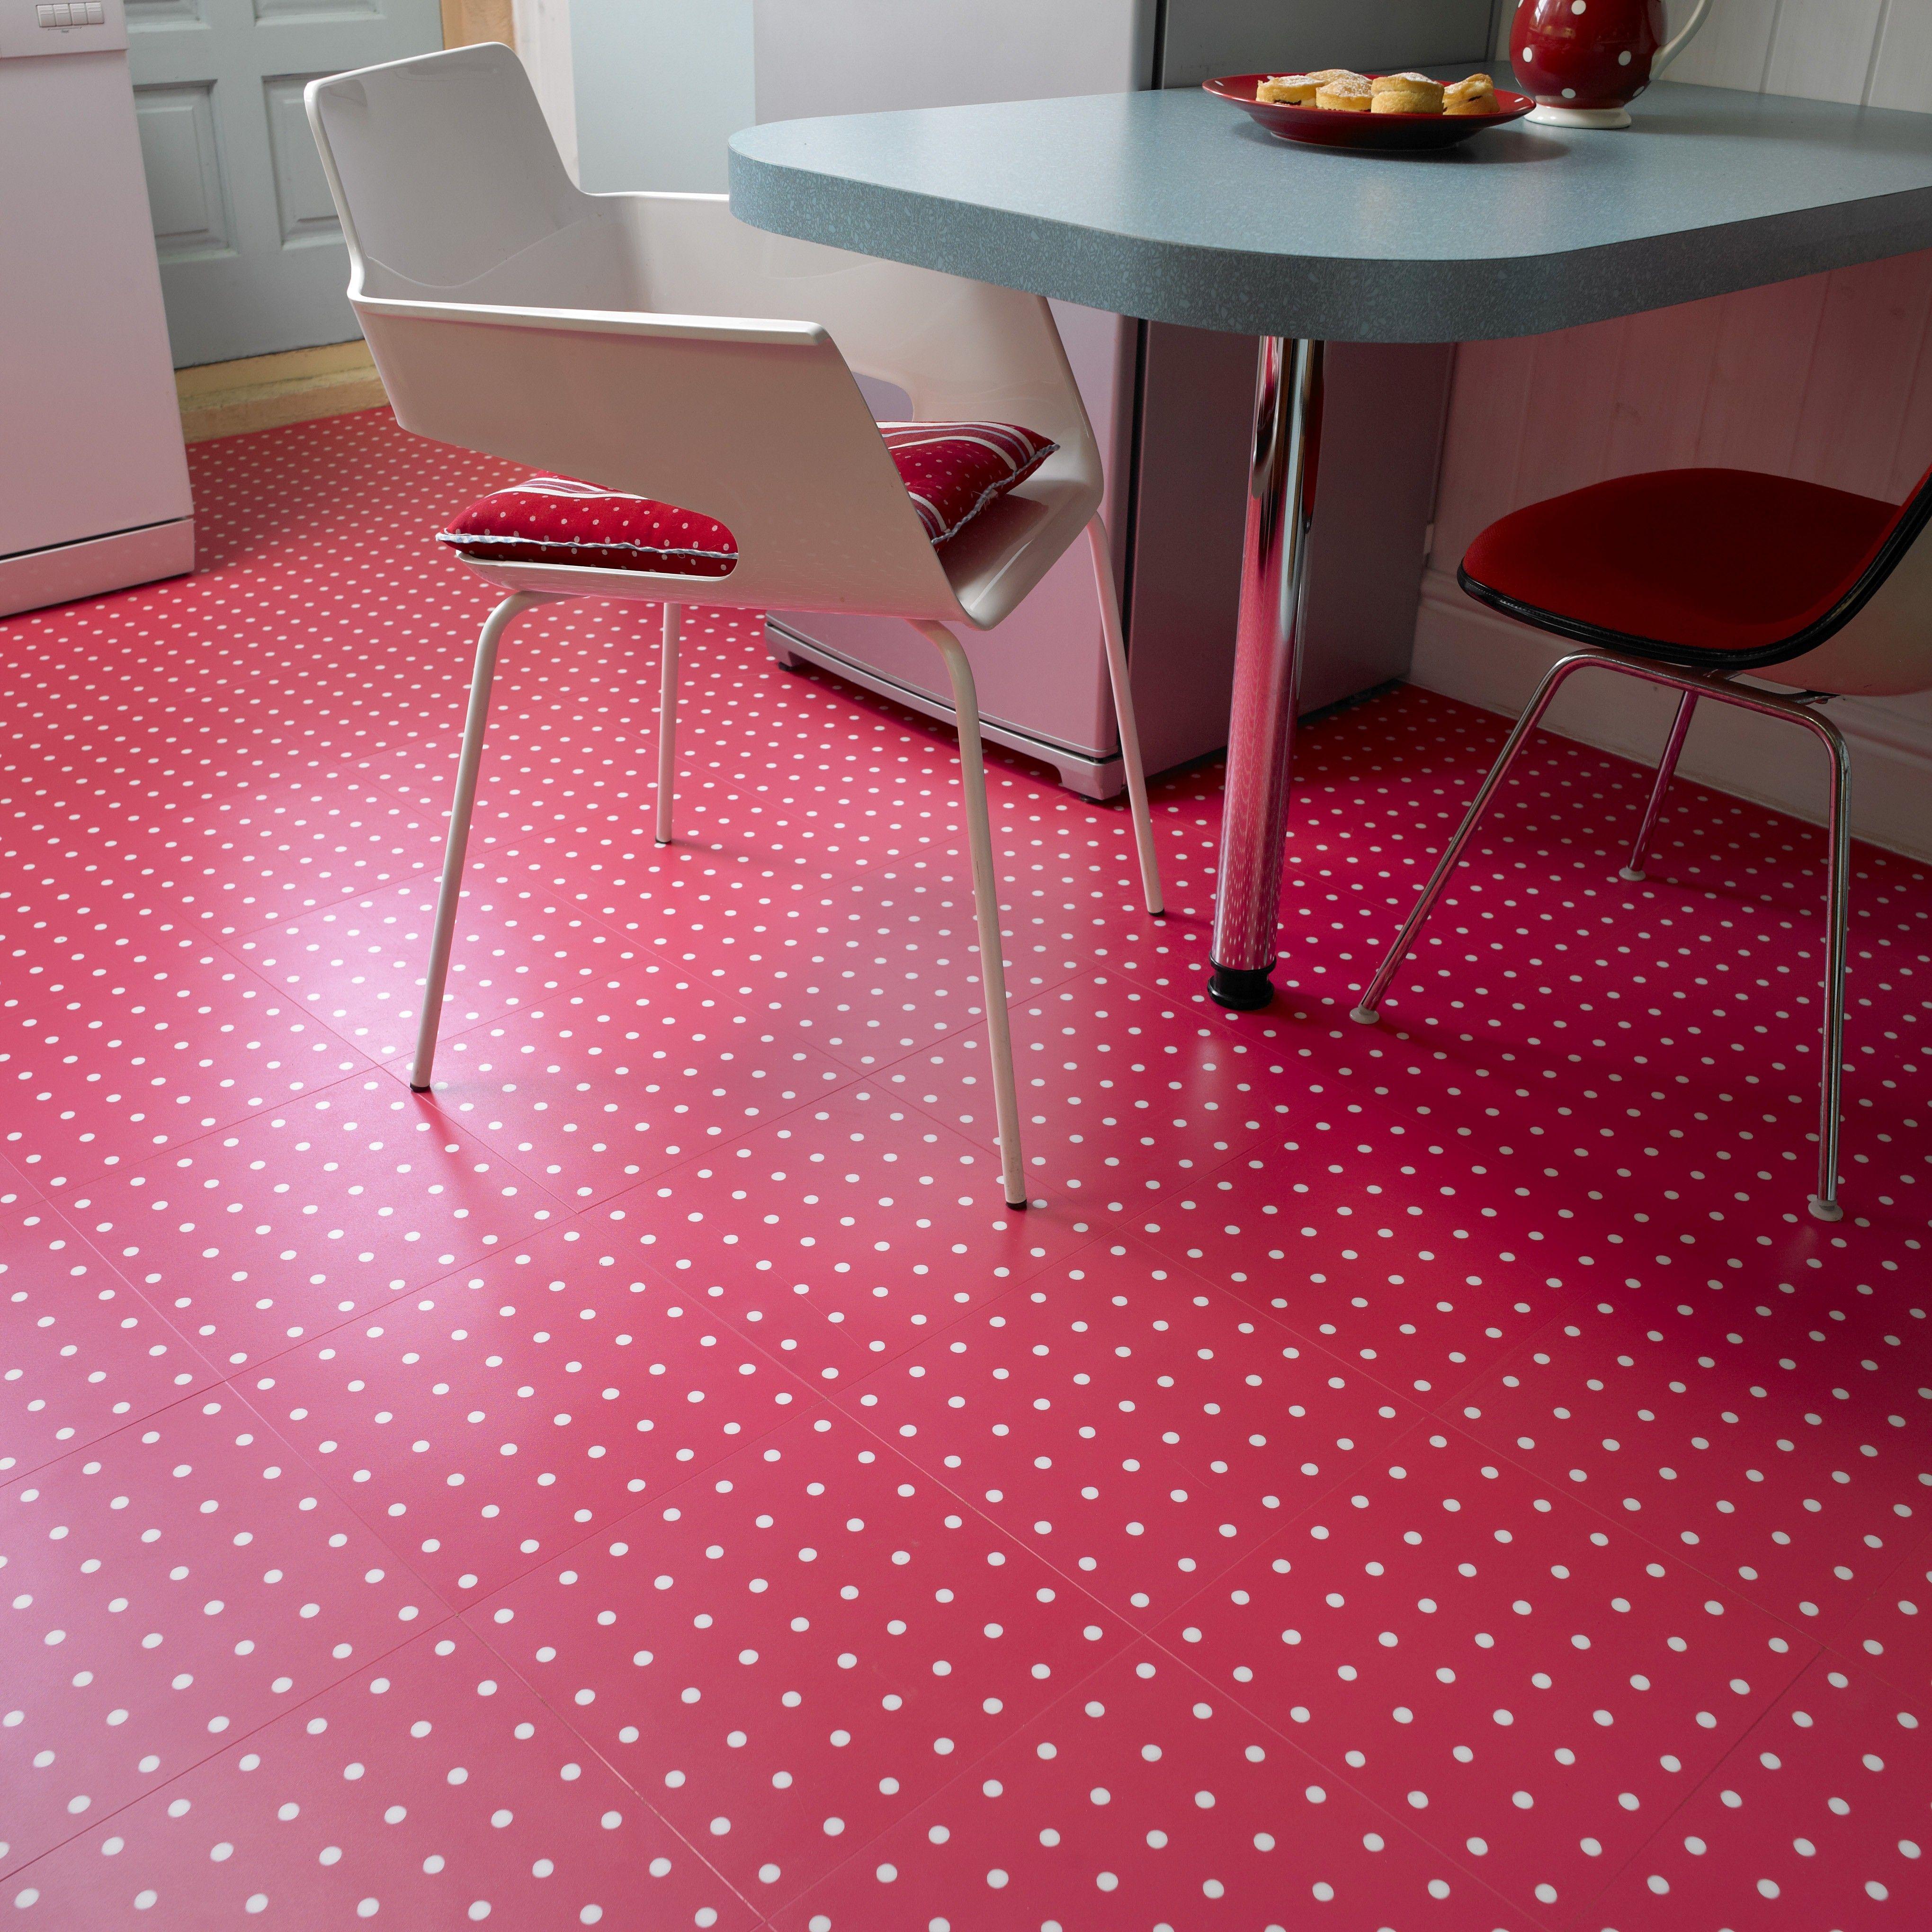 Vinyl flooring enables a multitude of designs including